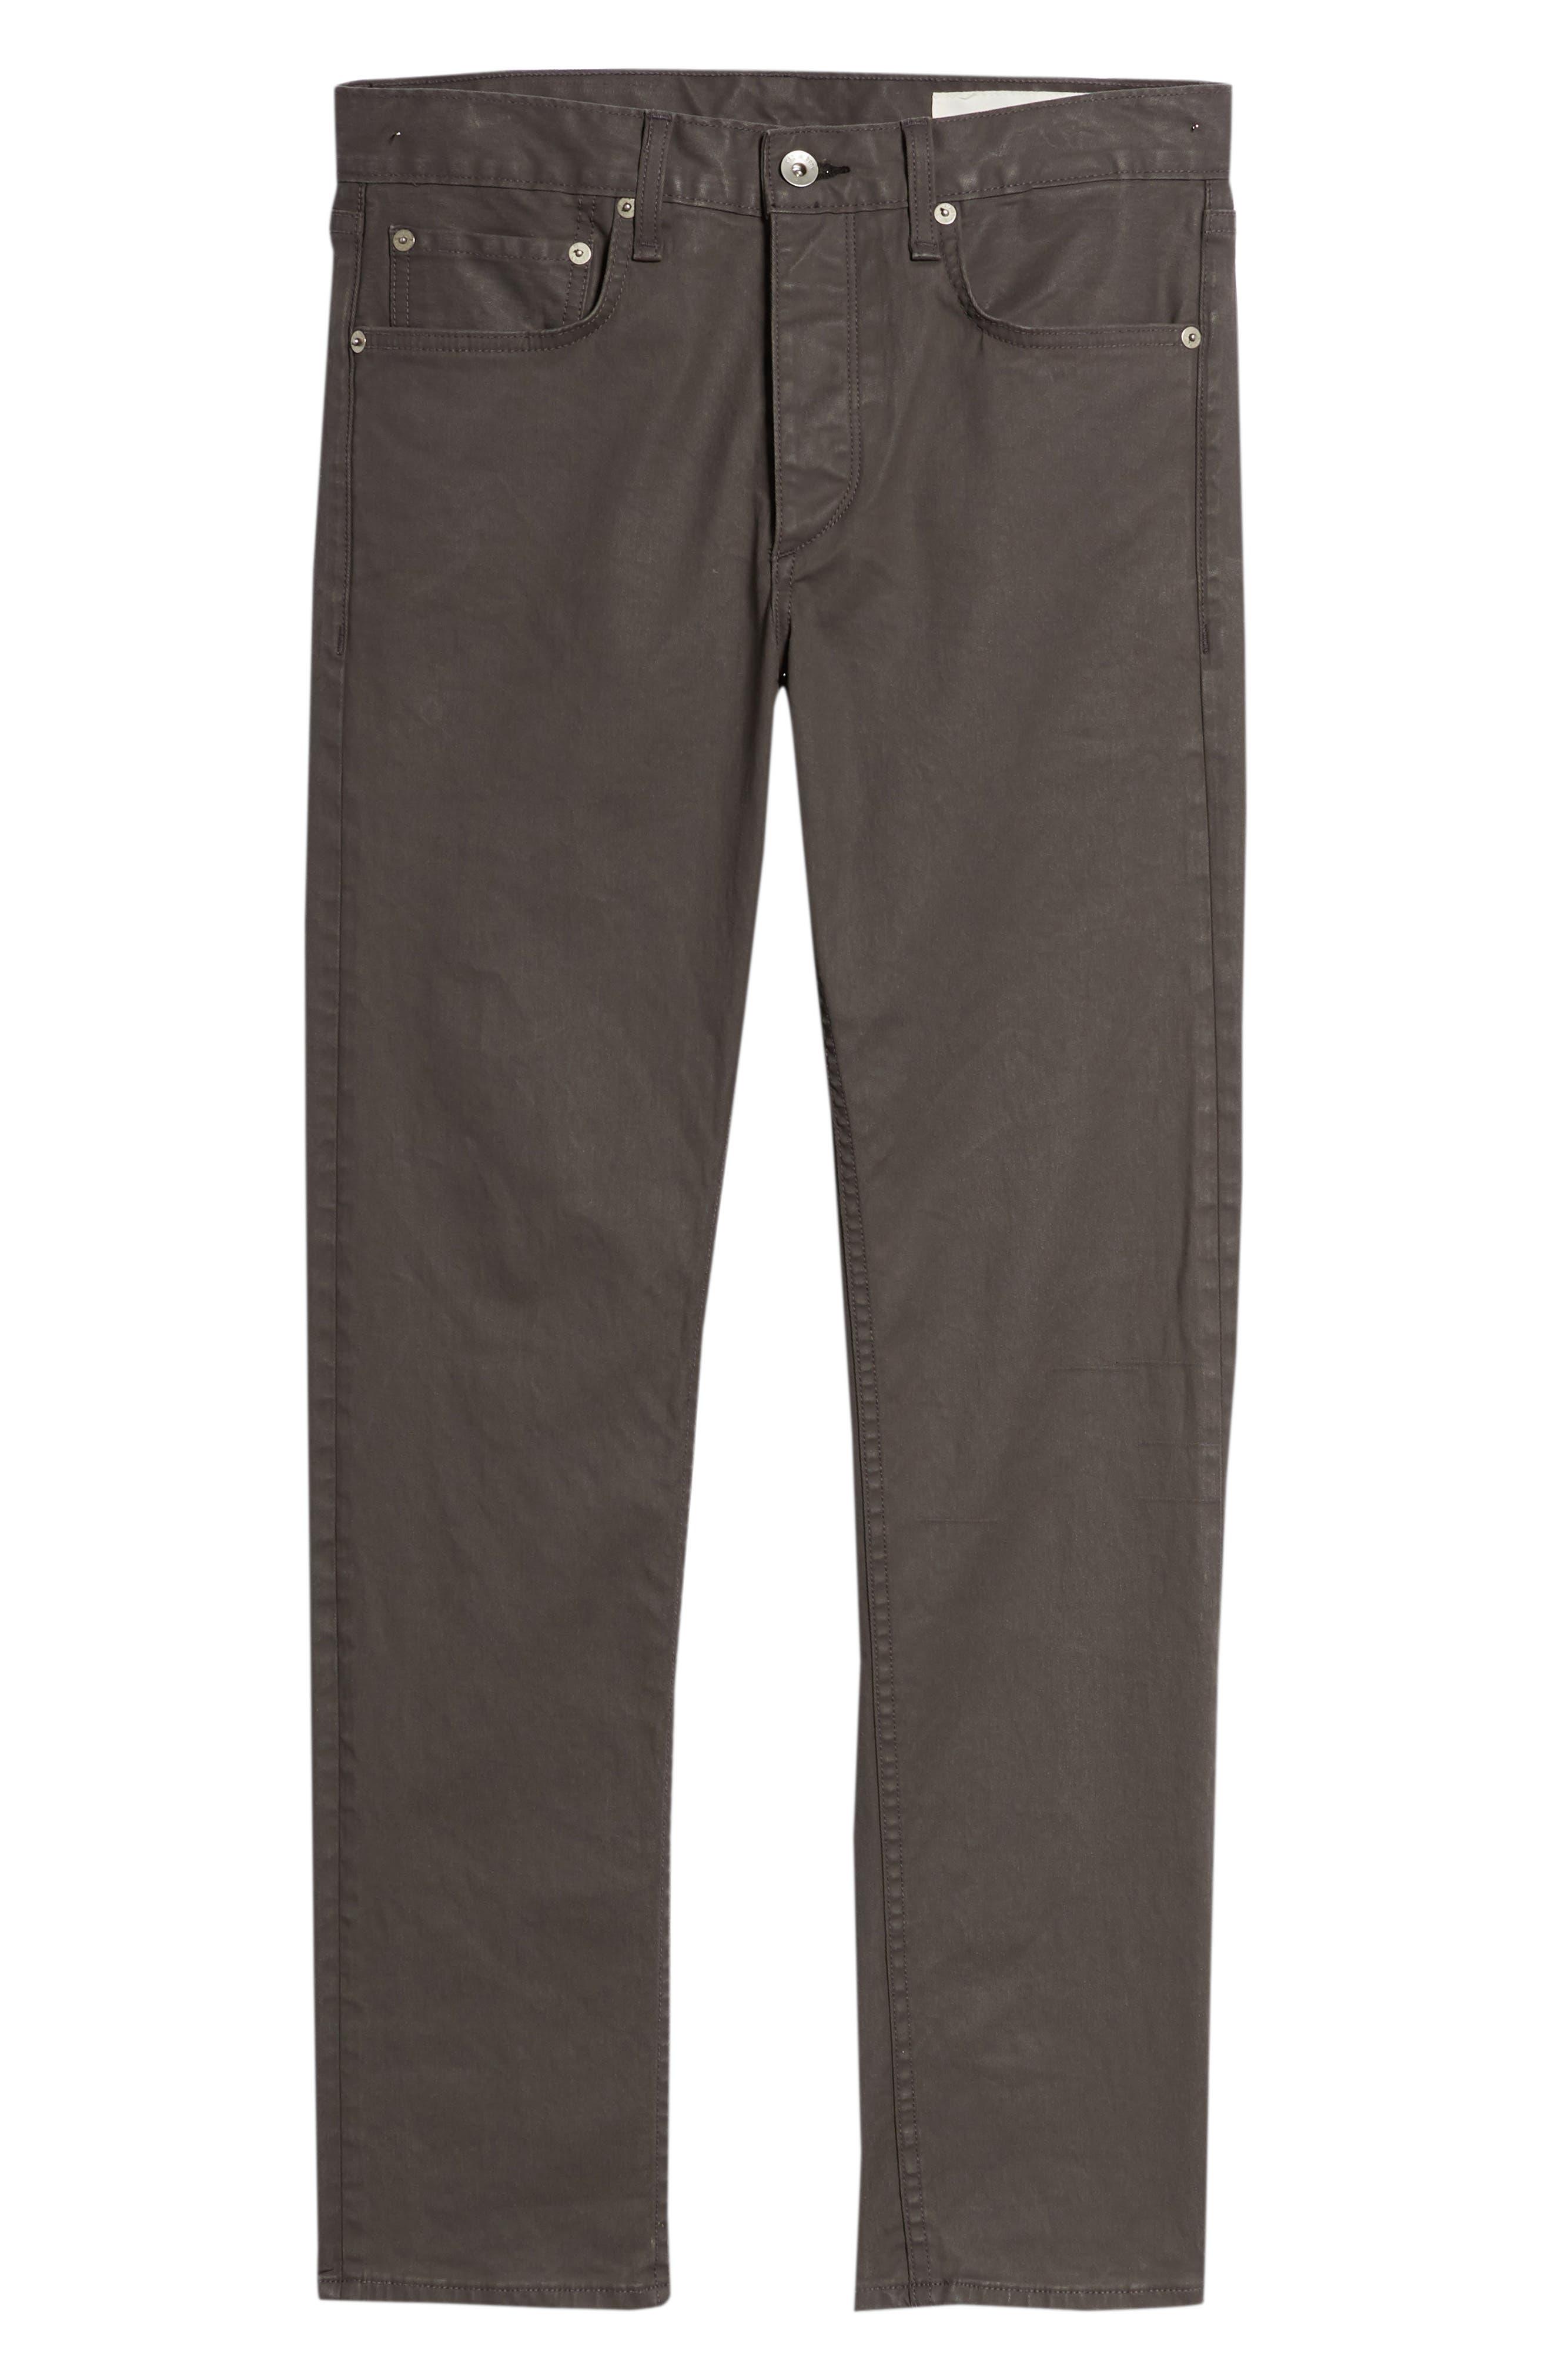 RAG & BONE, Fit 2 Slim Fit Pants, Alternate thumbnail 6, color, 020